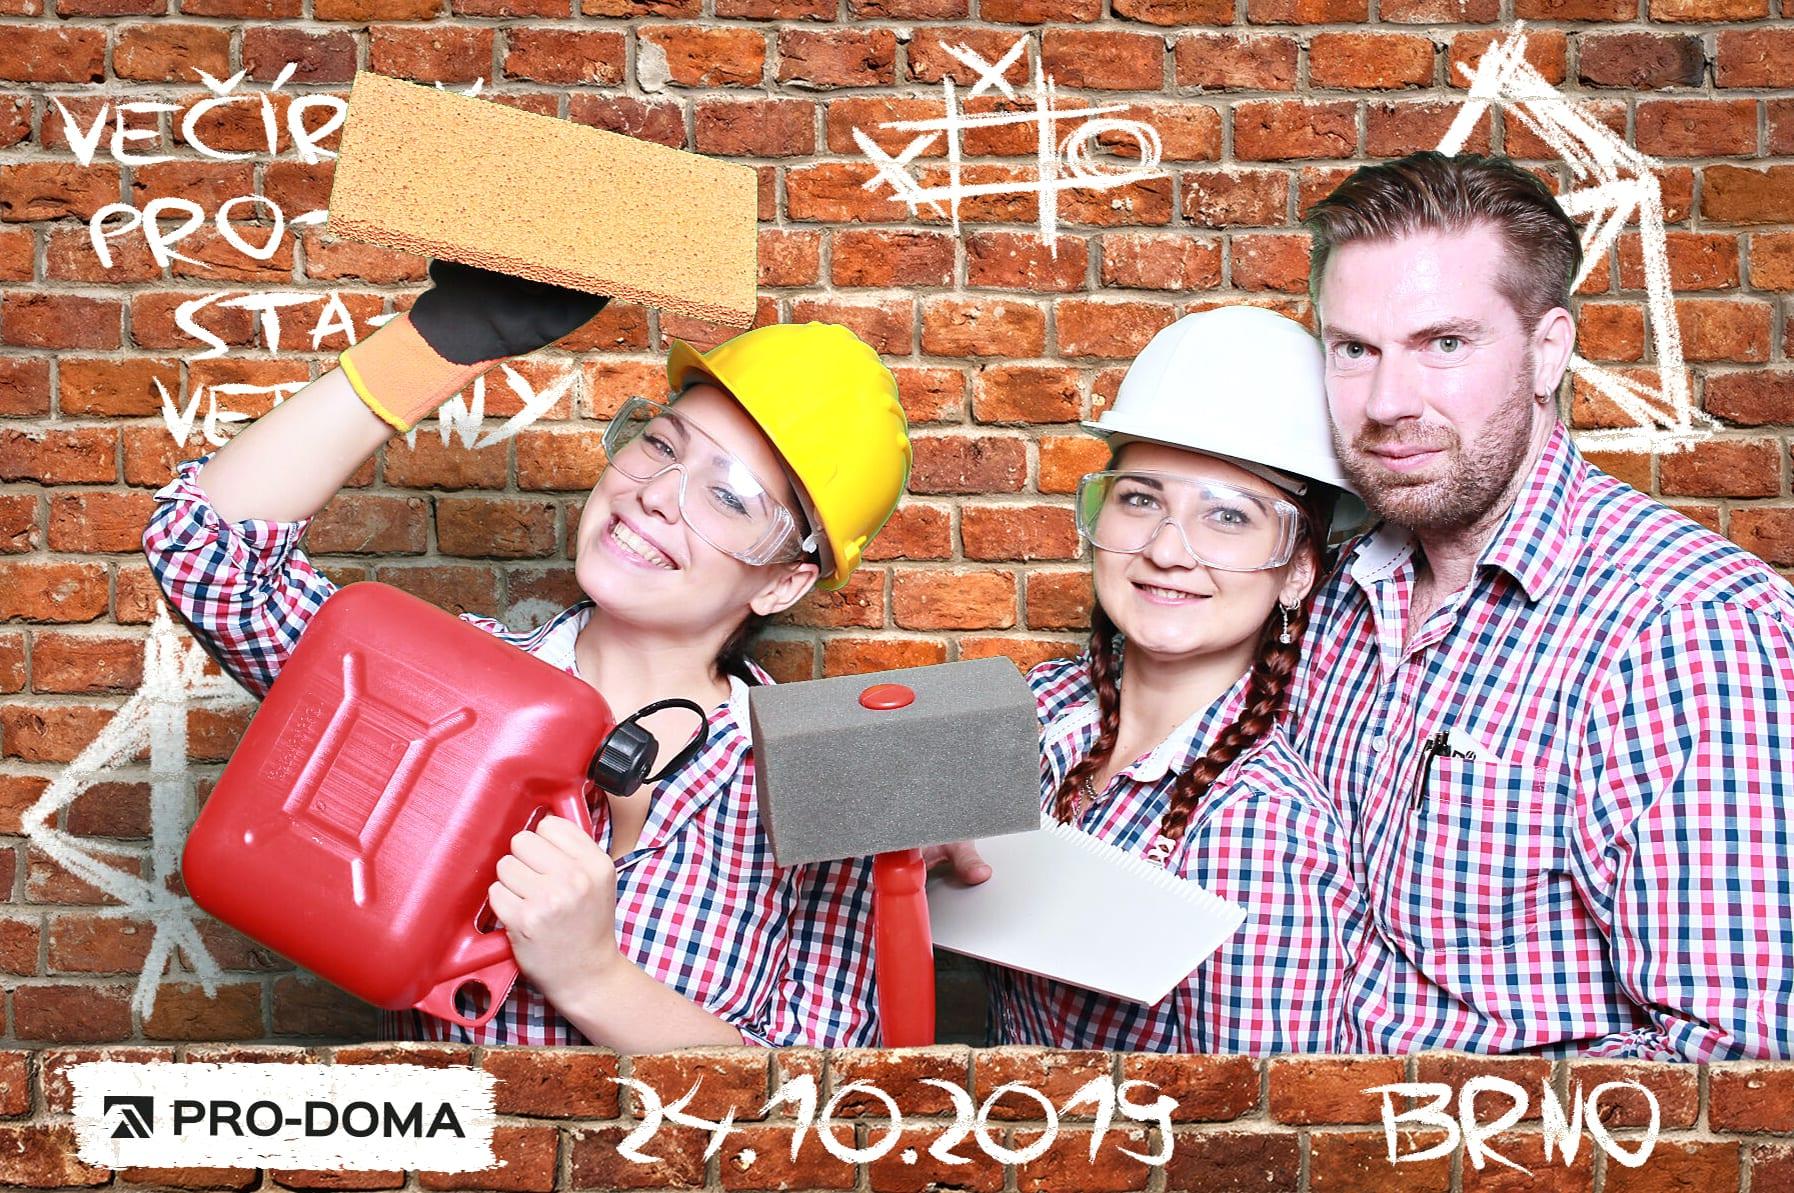 fotokoutek-brno-firemni-vecirek-pro-doma-24-10-2019-664962